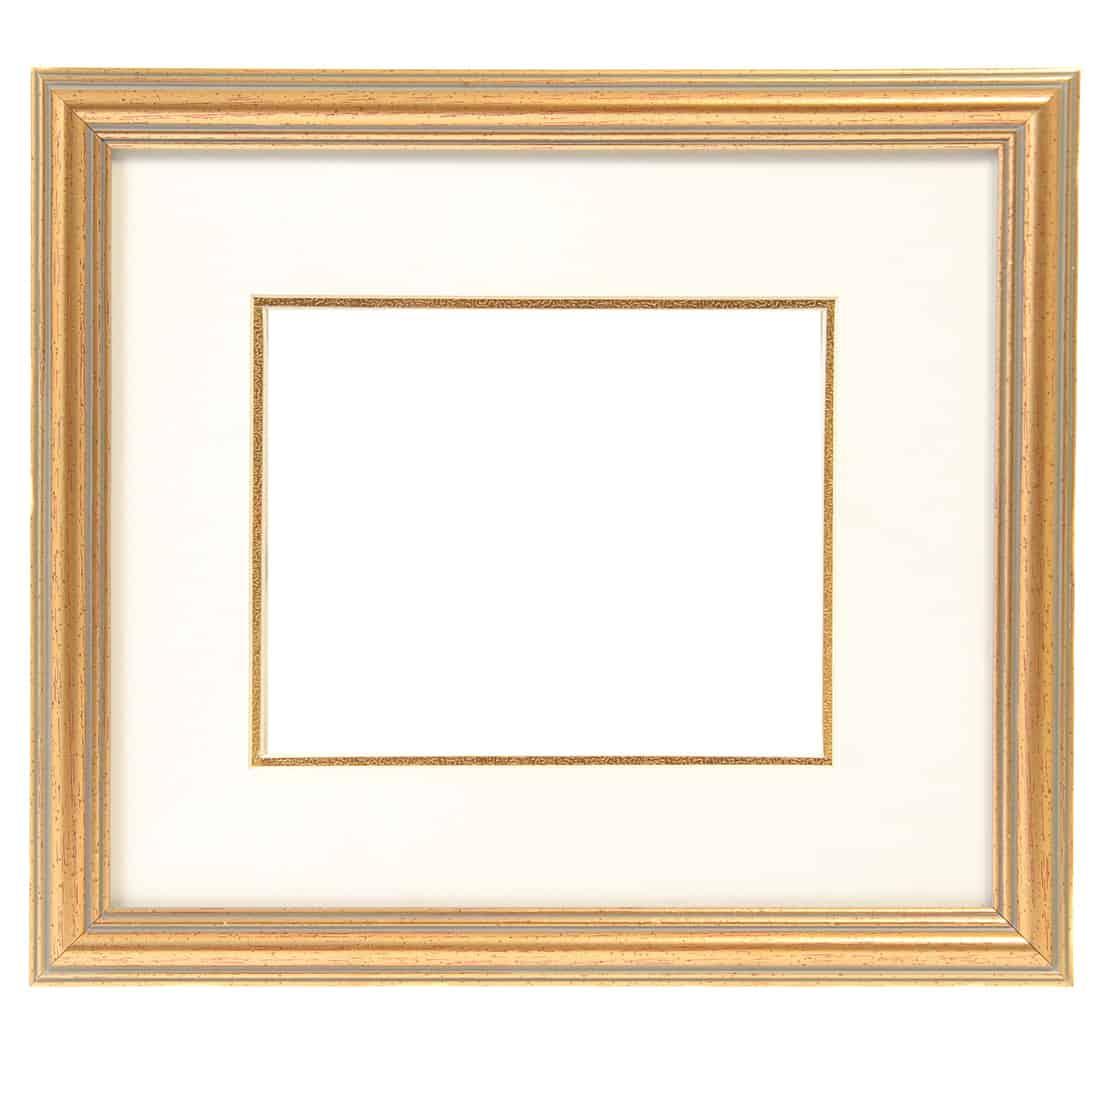 Baget frame isolated on white